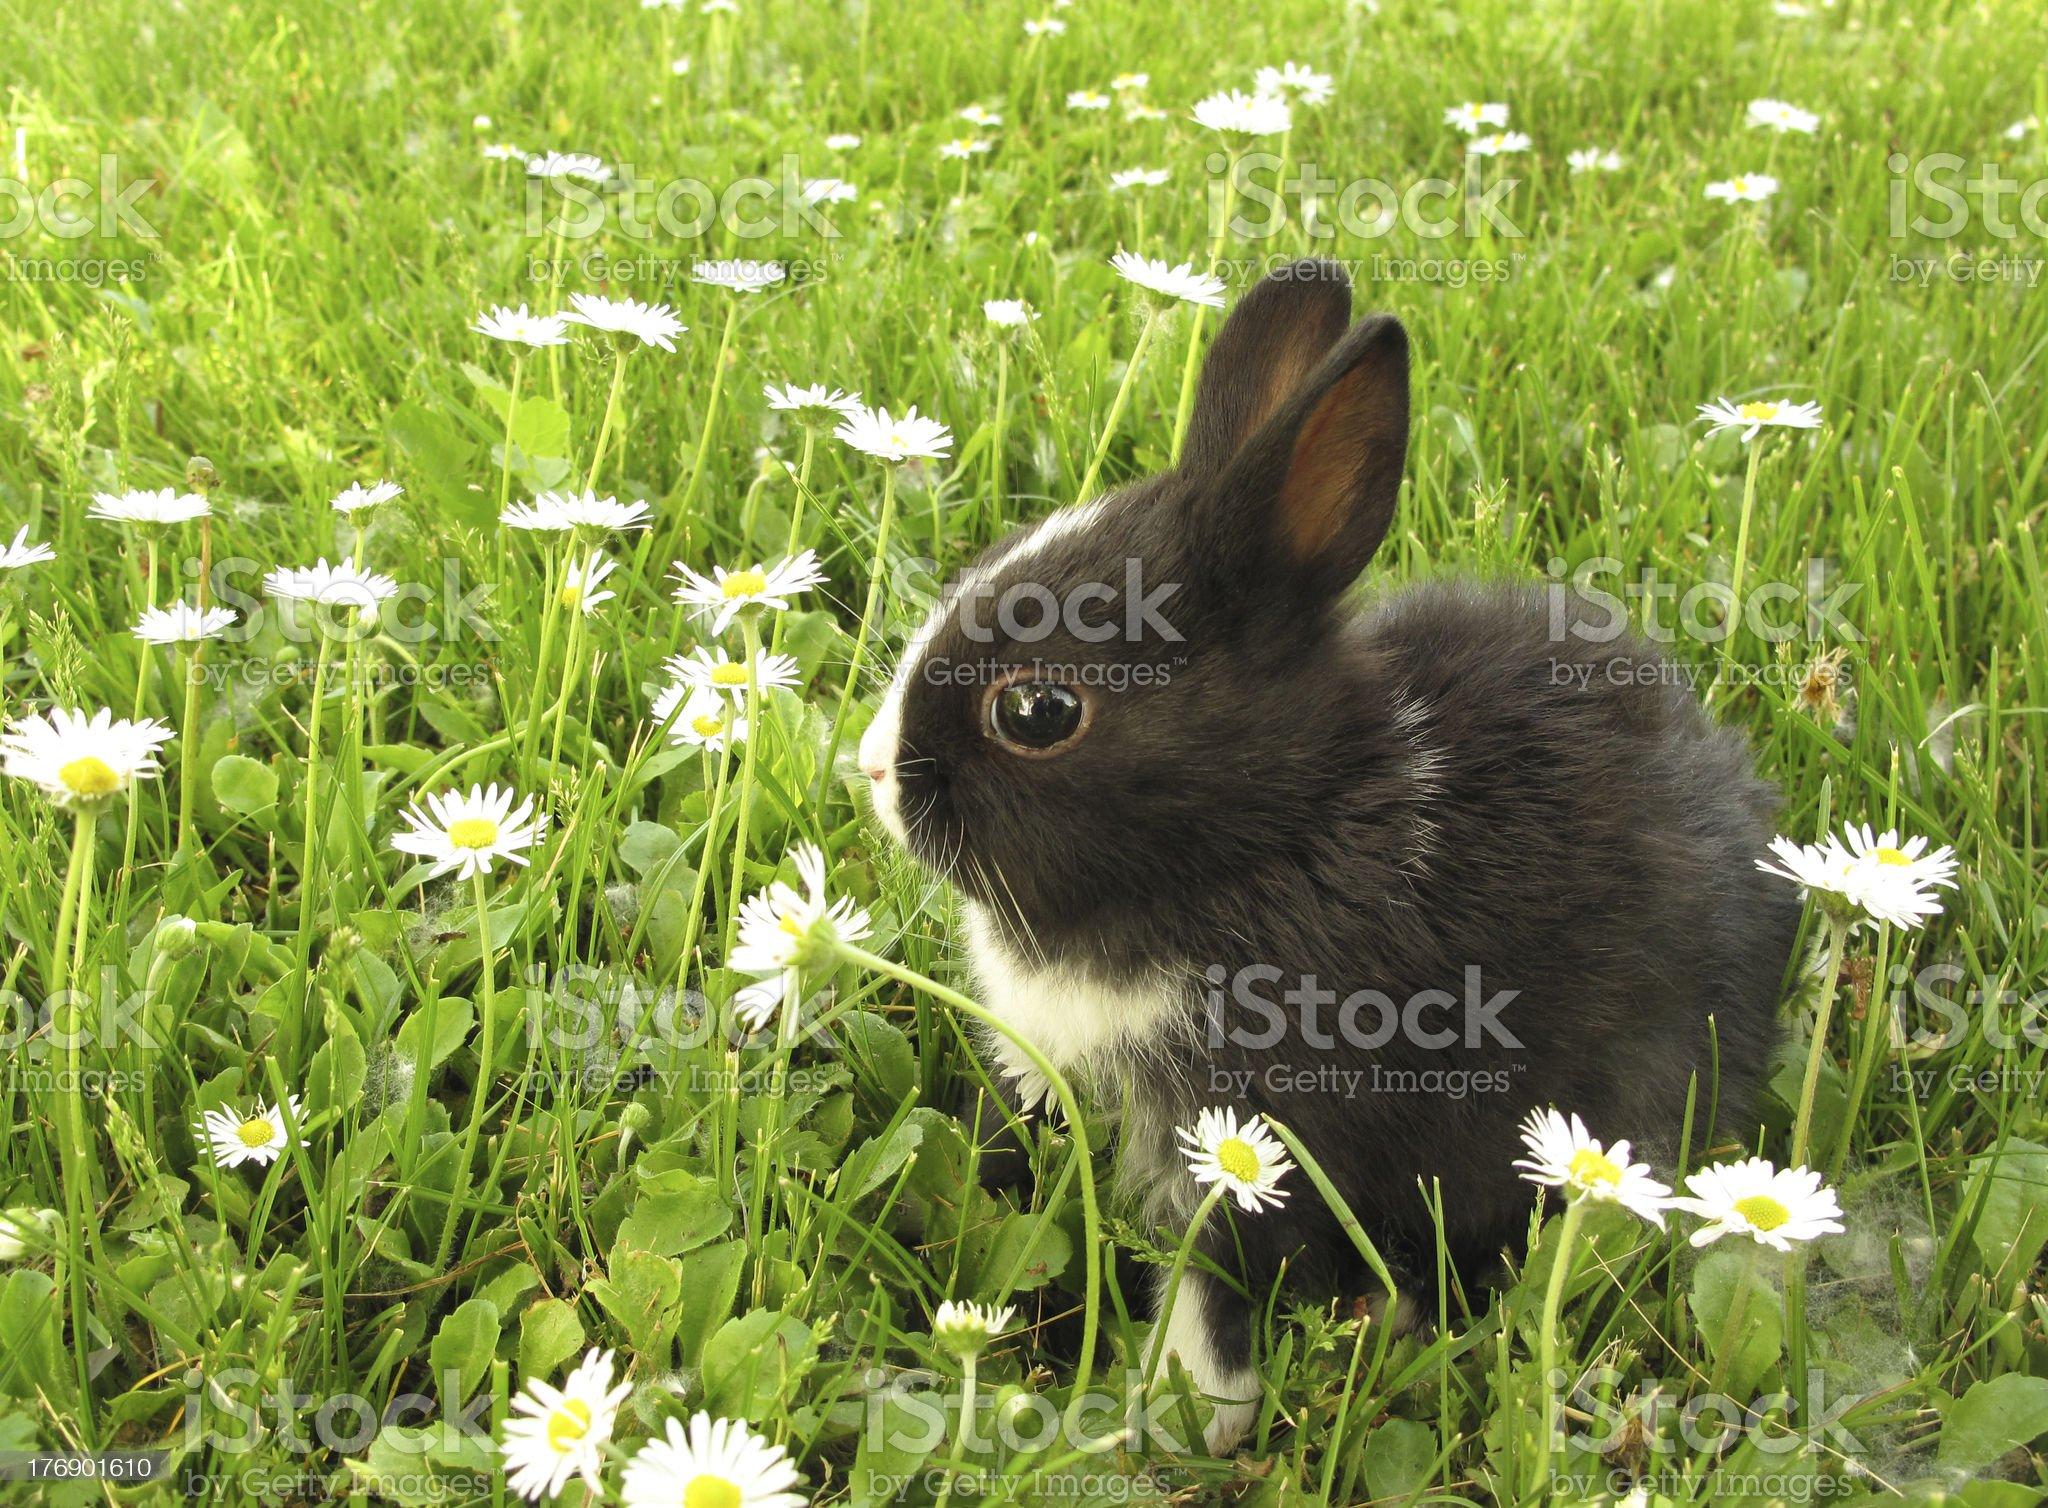 Rabbit bunny black and white royalty-free stock photo